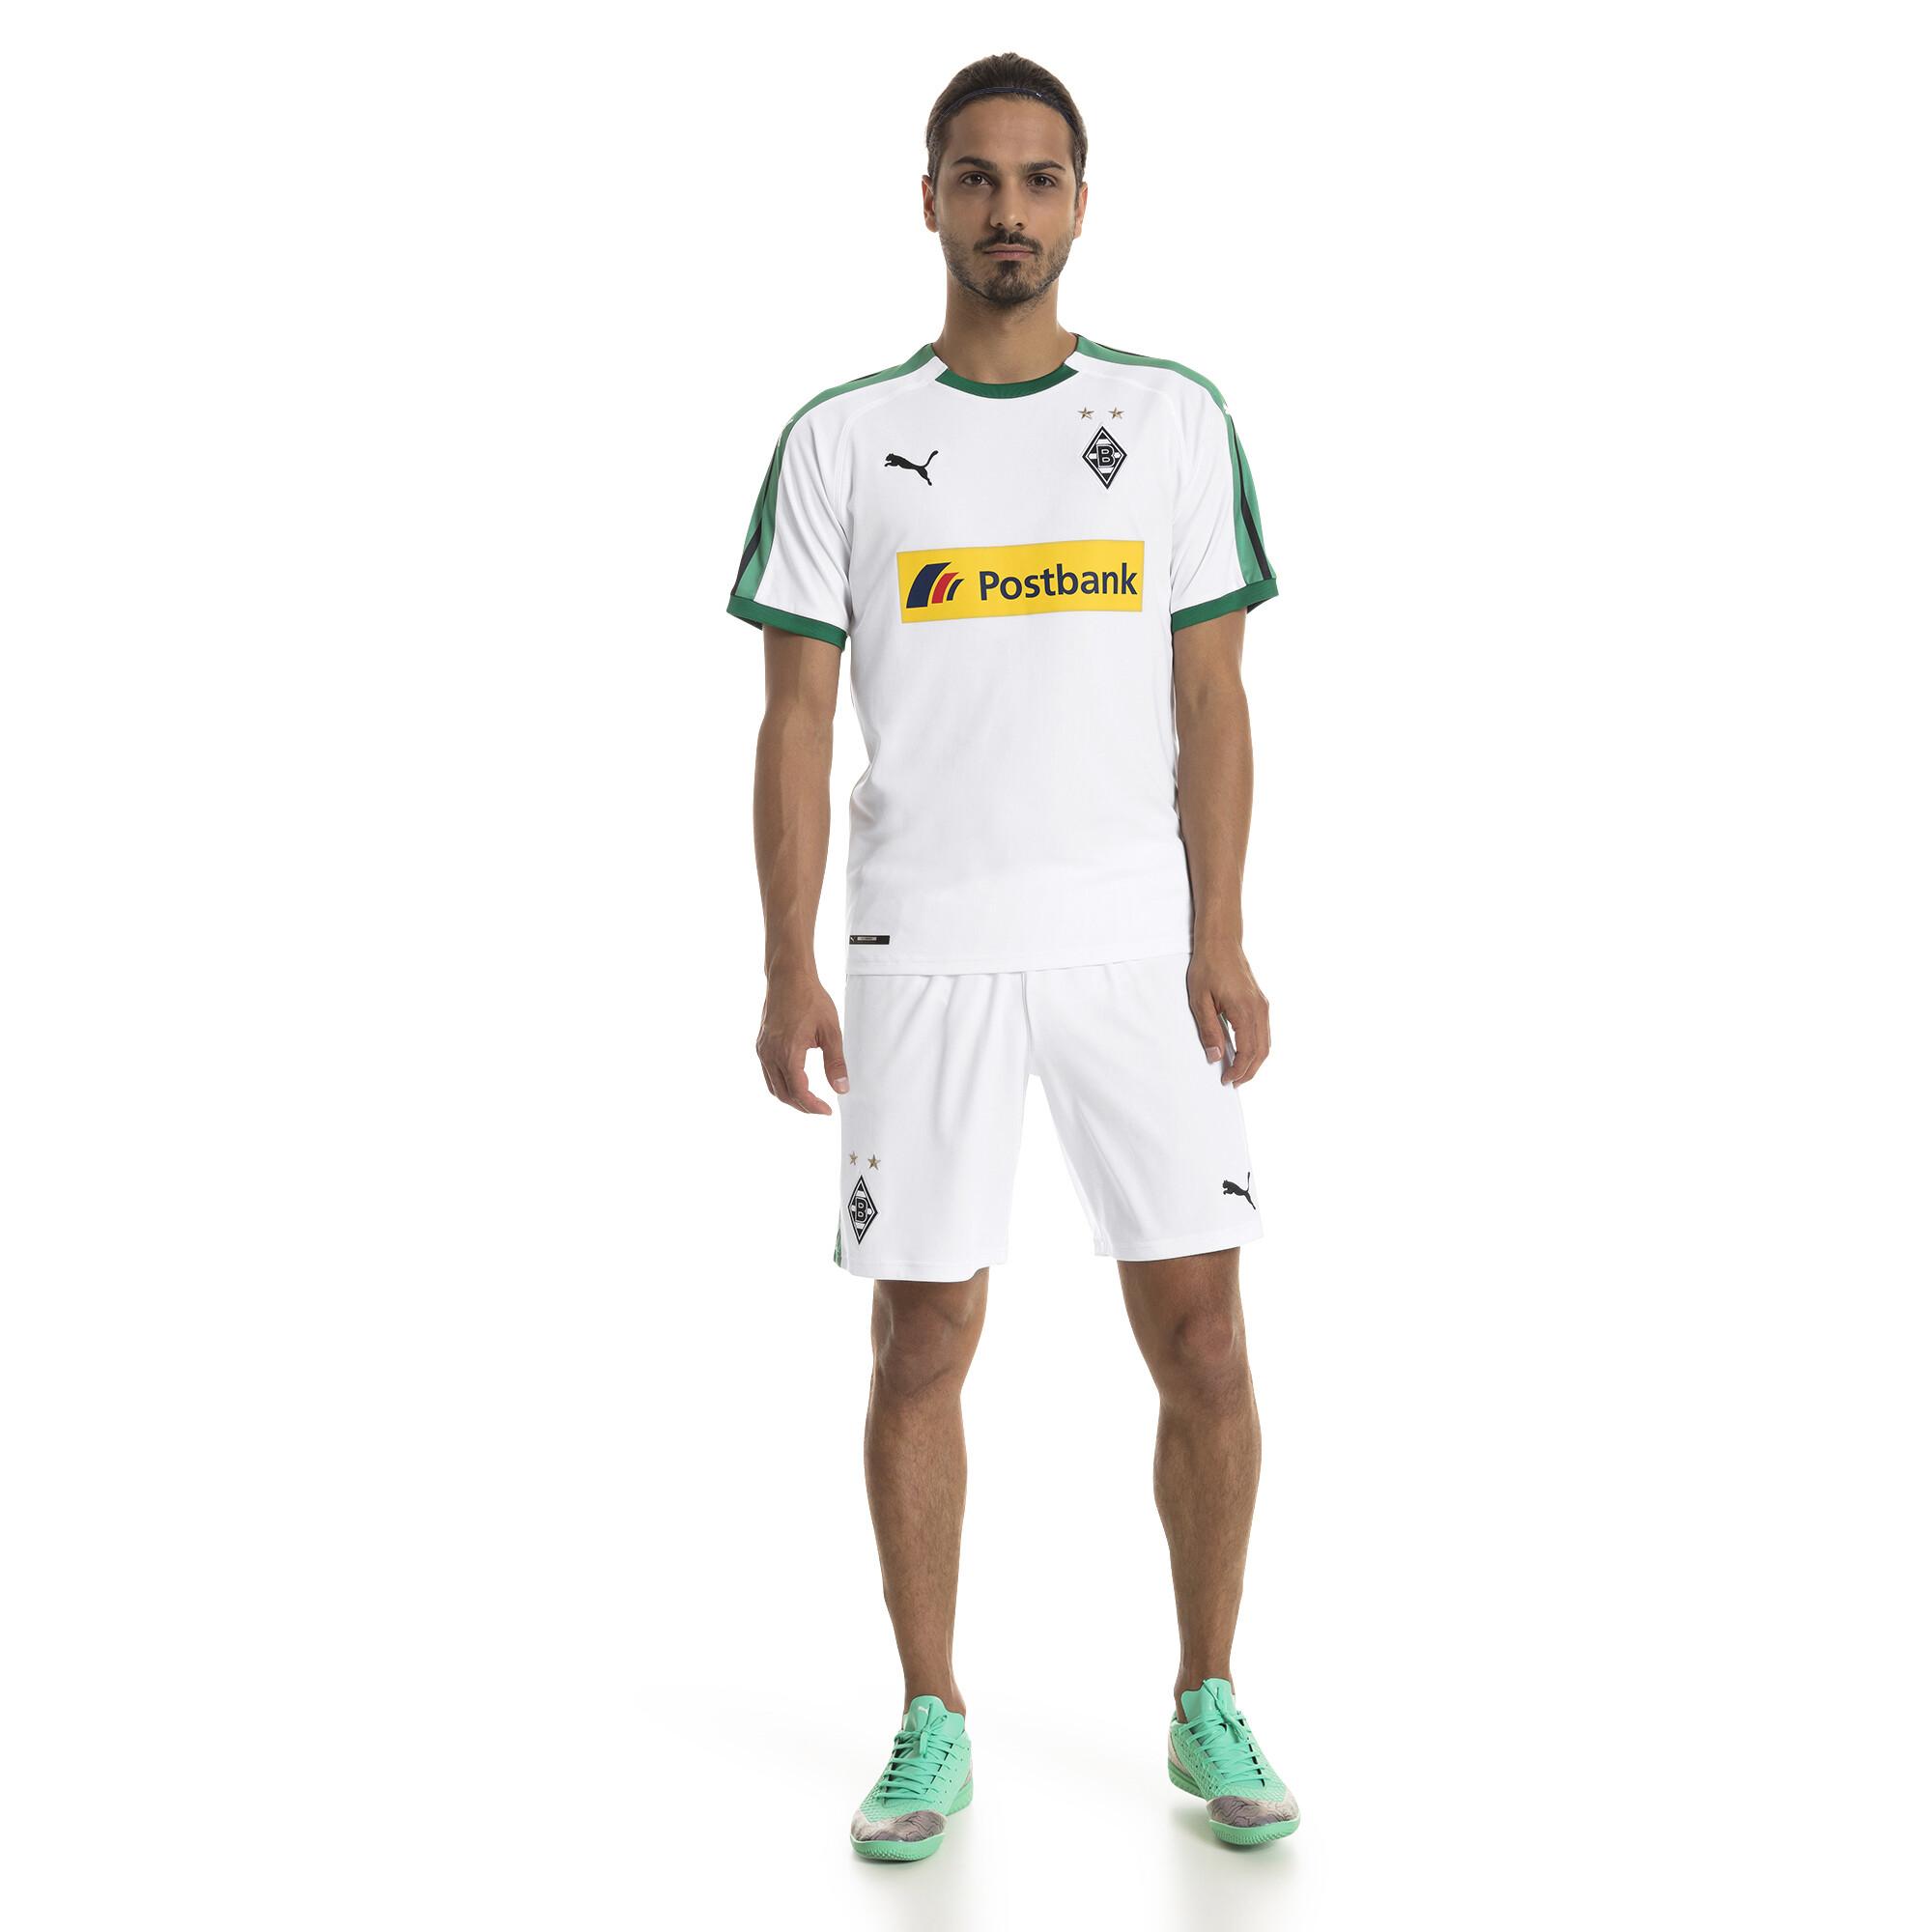 Indexbild 11 - PUMA Borussia Mönchengladbach Herren Replica Heimtrikot Männer Fußballtrikot Neu